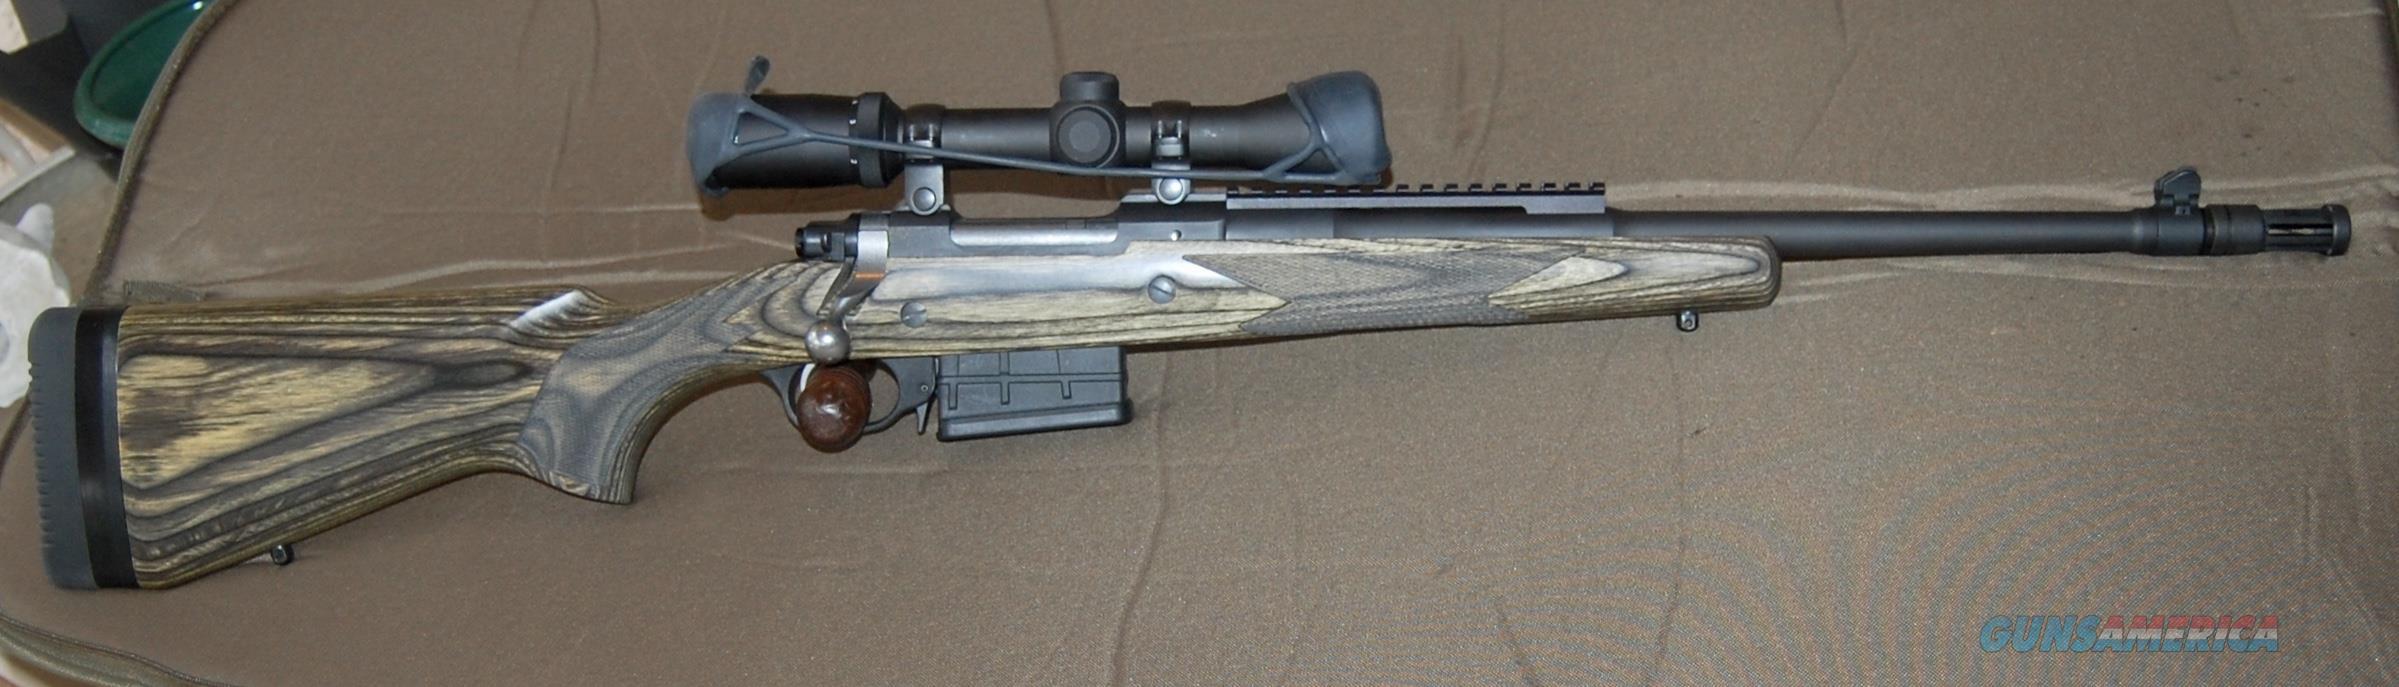 RGER GUNSITE SCOUT RIFLE 308 W/BURRIS 2X7 POWER SCOPE  Guns > Rifles > Ruger Rifles > Gunsite